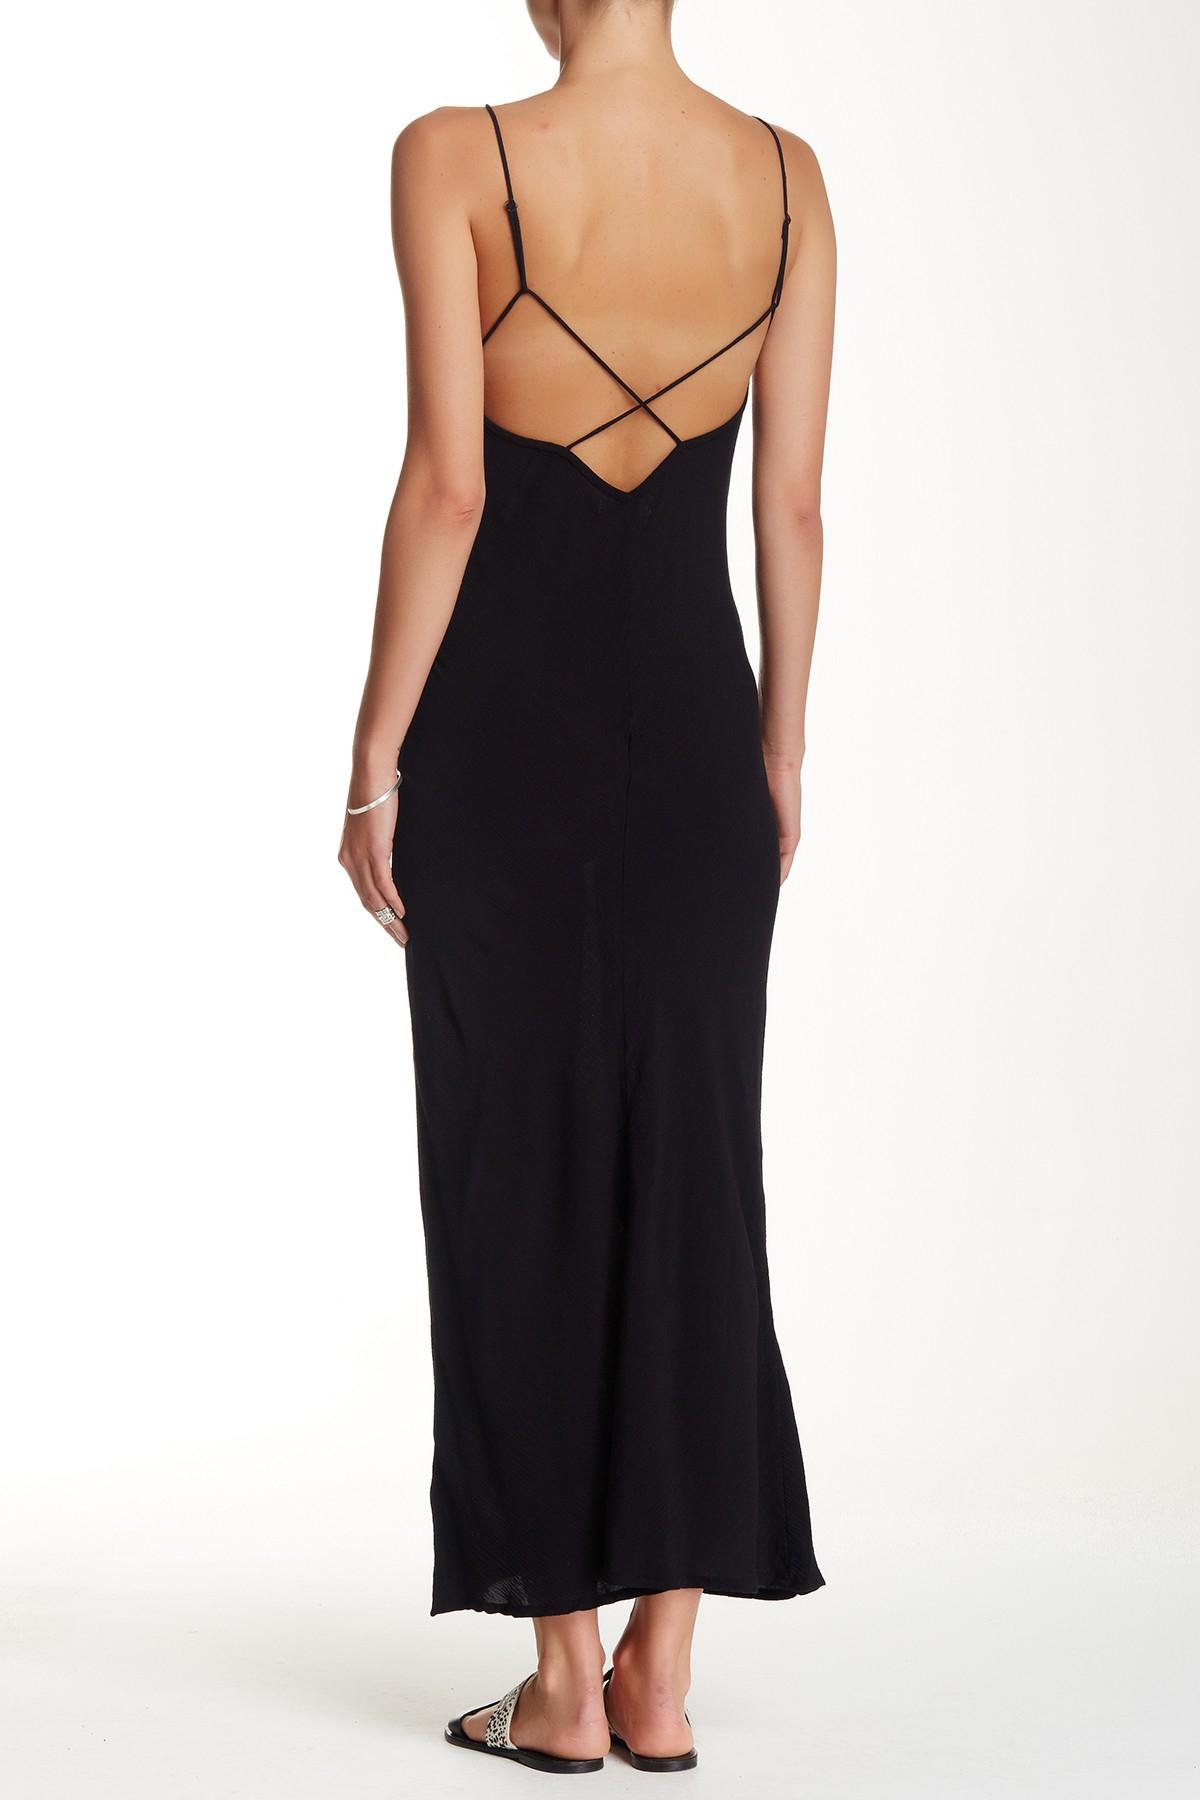 Lyst volcom 21st century dress in black for Century 21 dress shirts